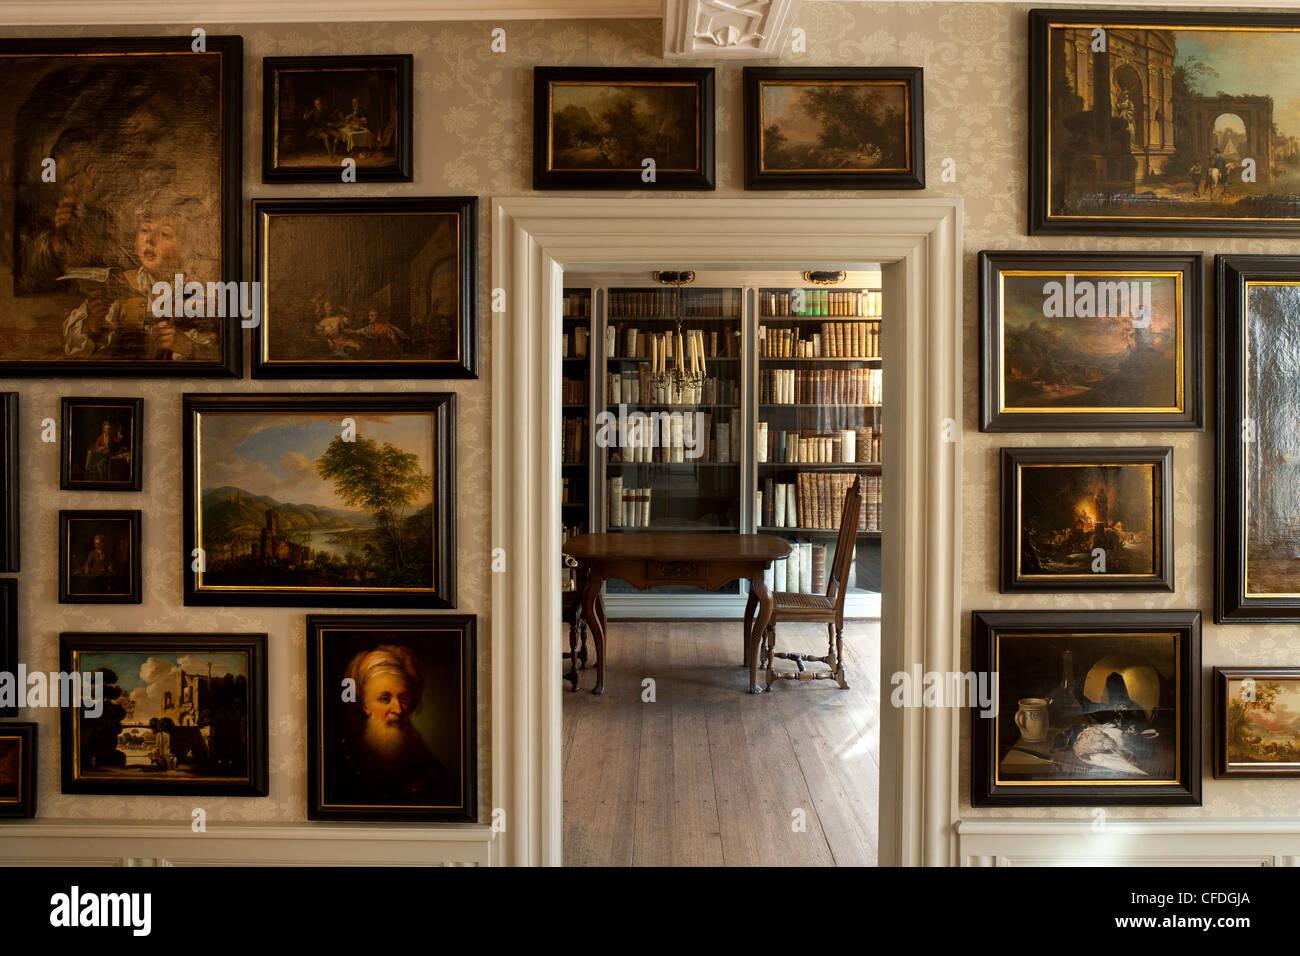 Large Frankfurter Stock Photos & Large Frankfurter Stock Images - Alamy